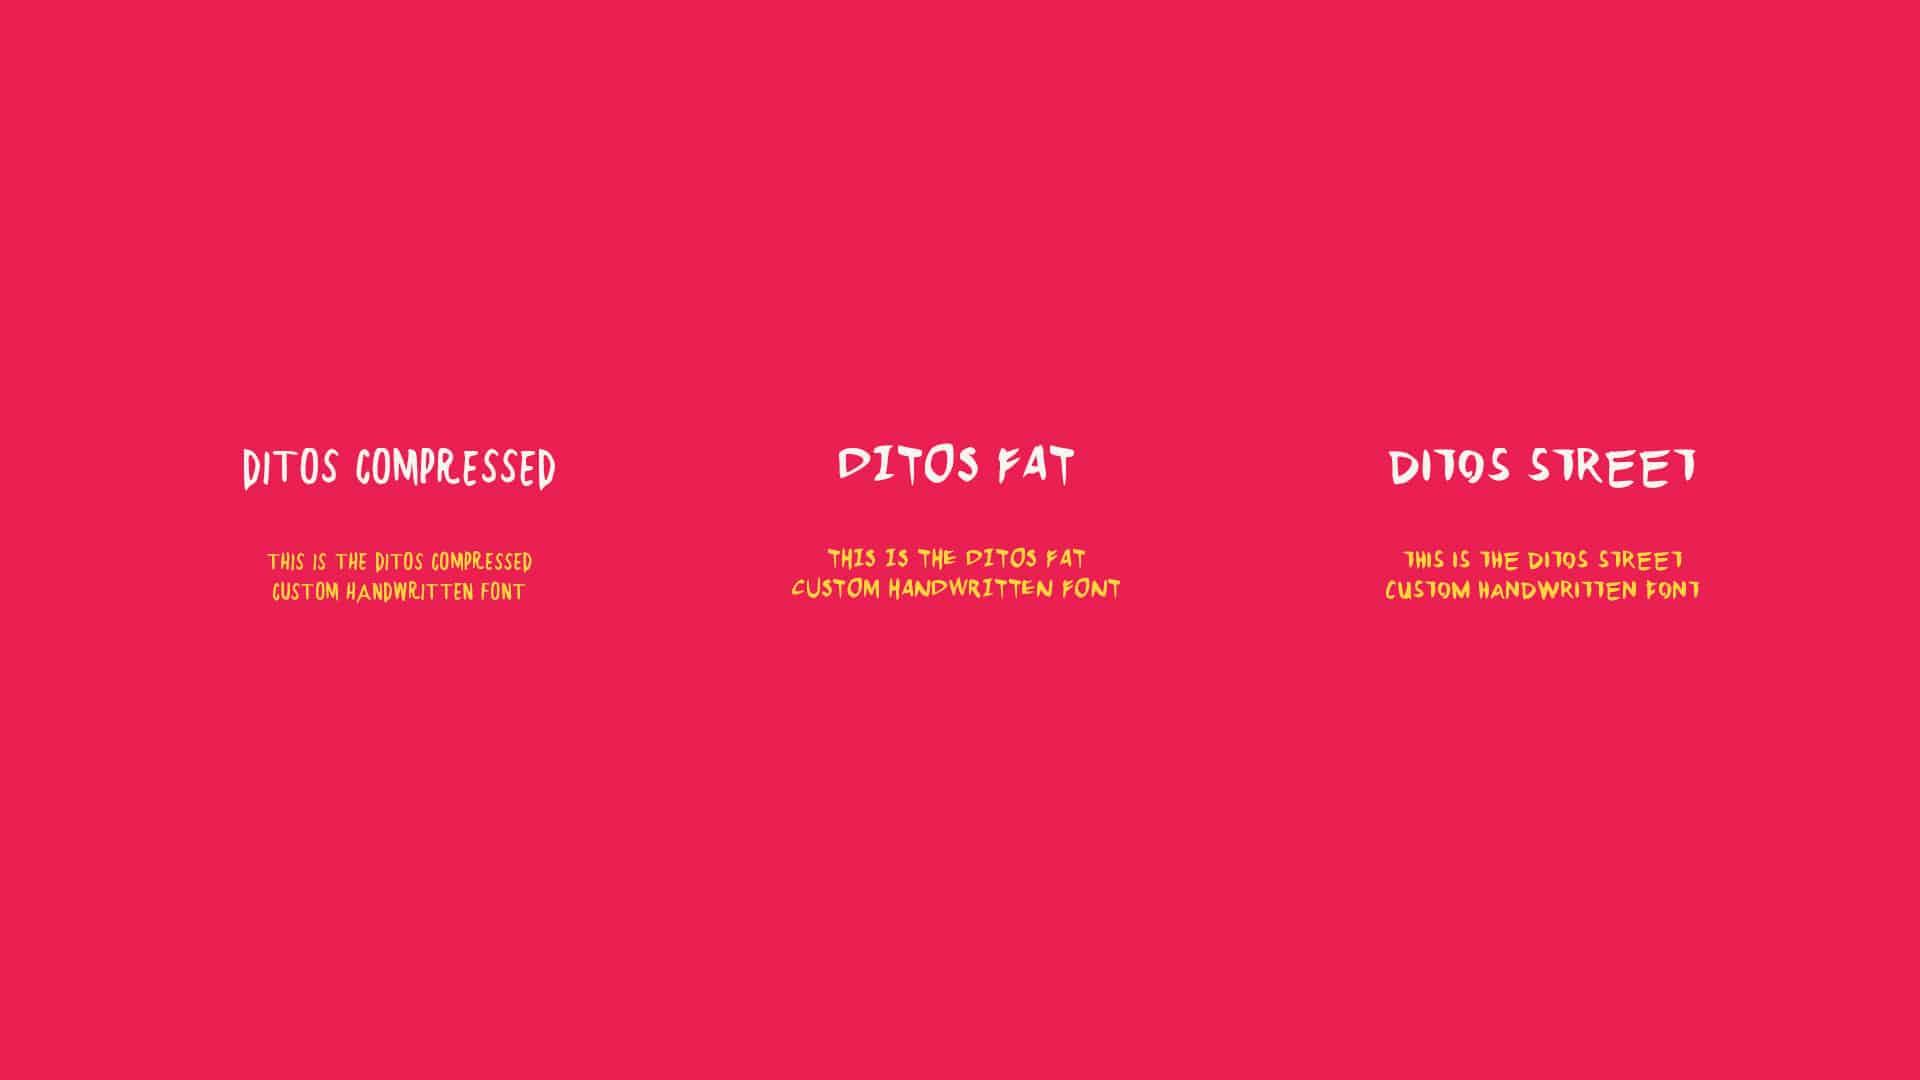 Banditos bar and kitchen rebranding and design by Vigor custom typography design